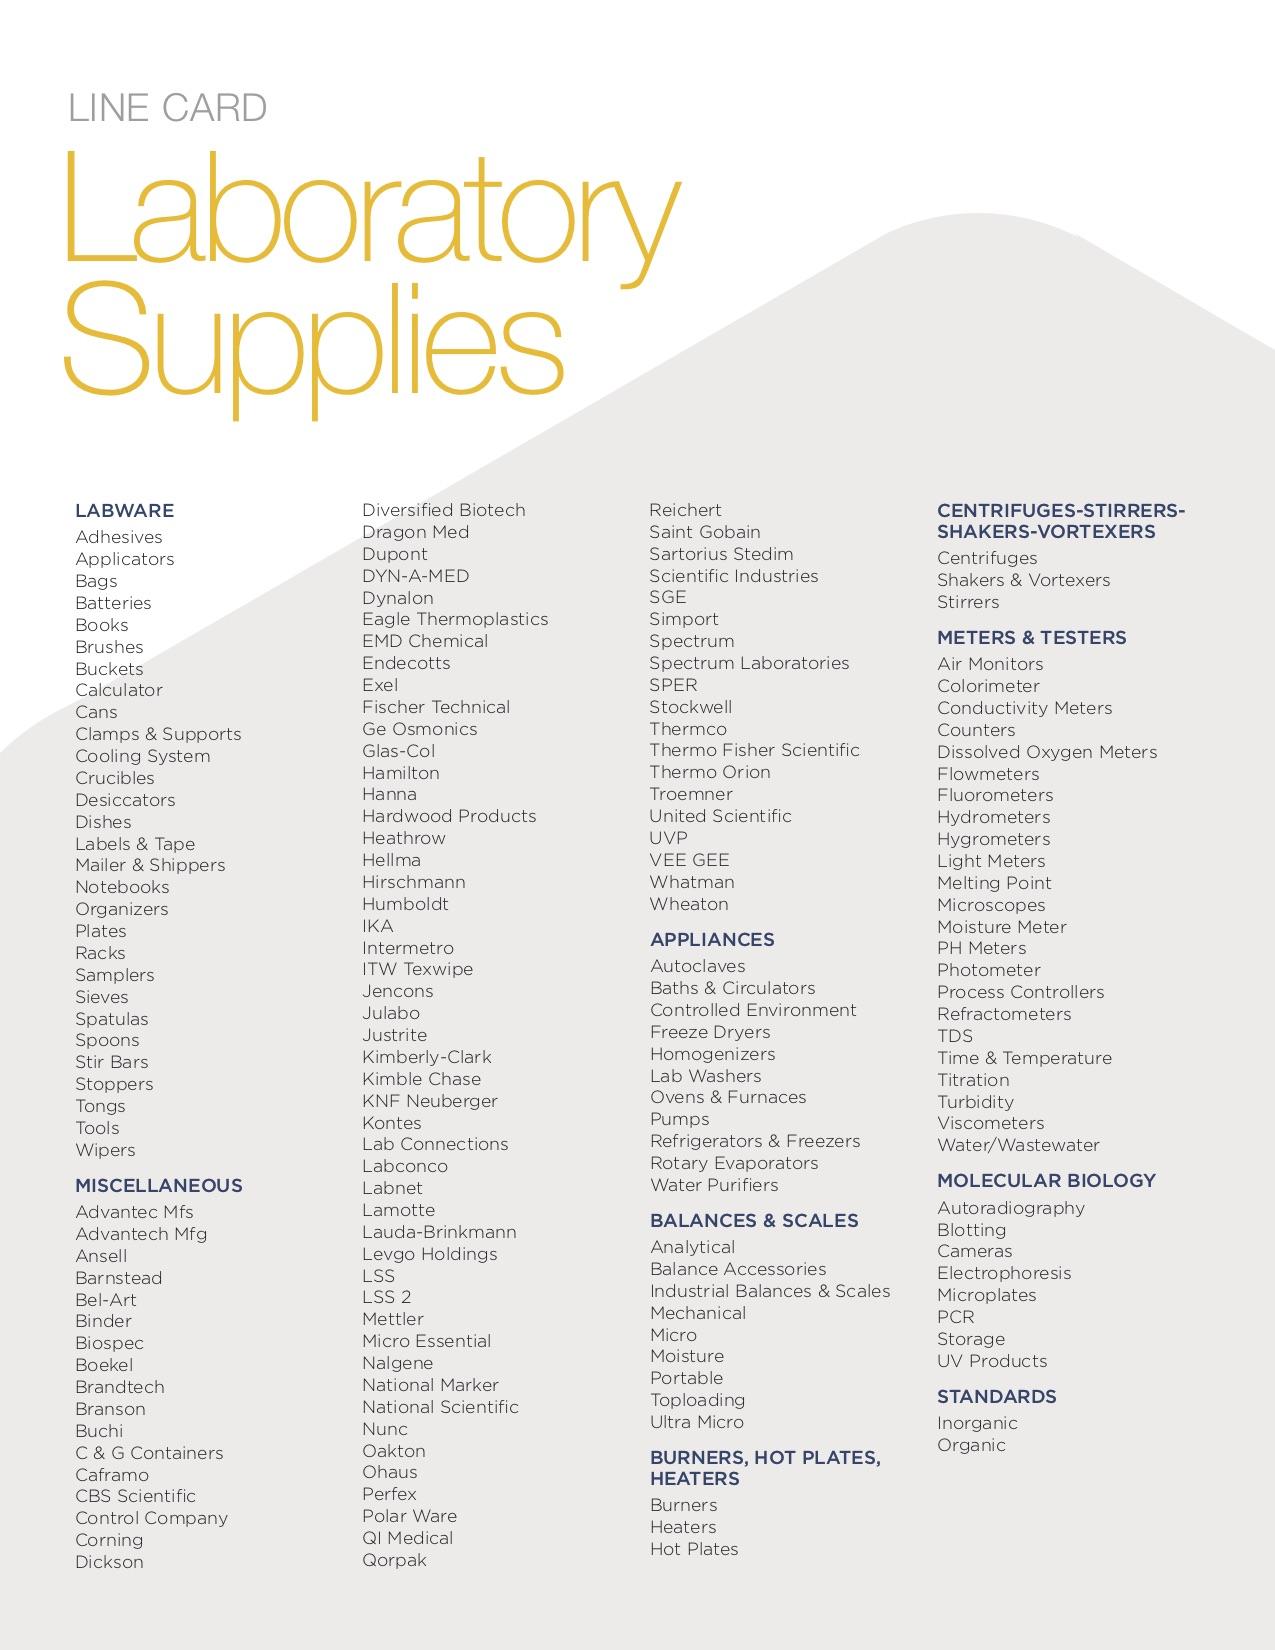 Line Card - Advance Scientific & Chemical